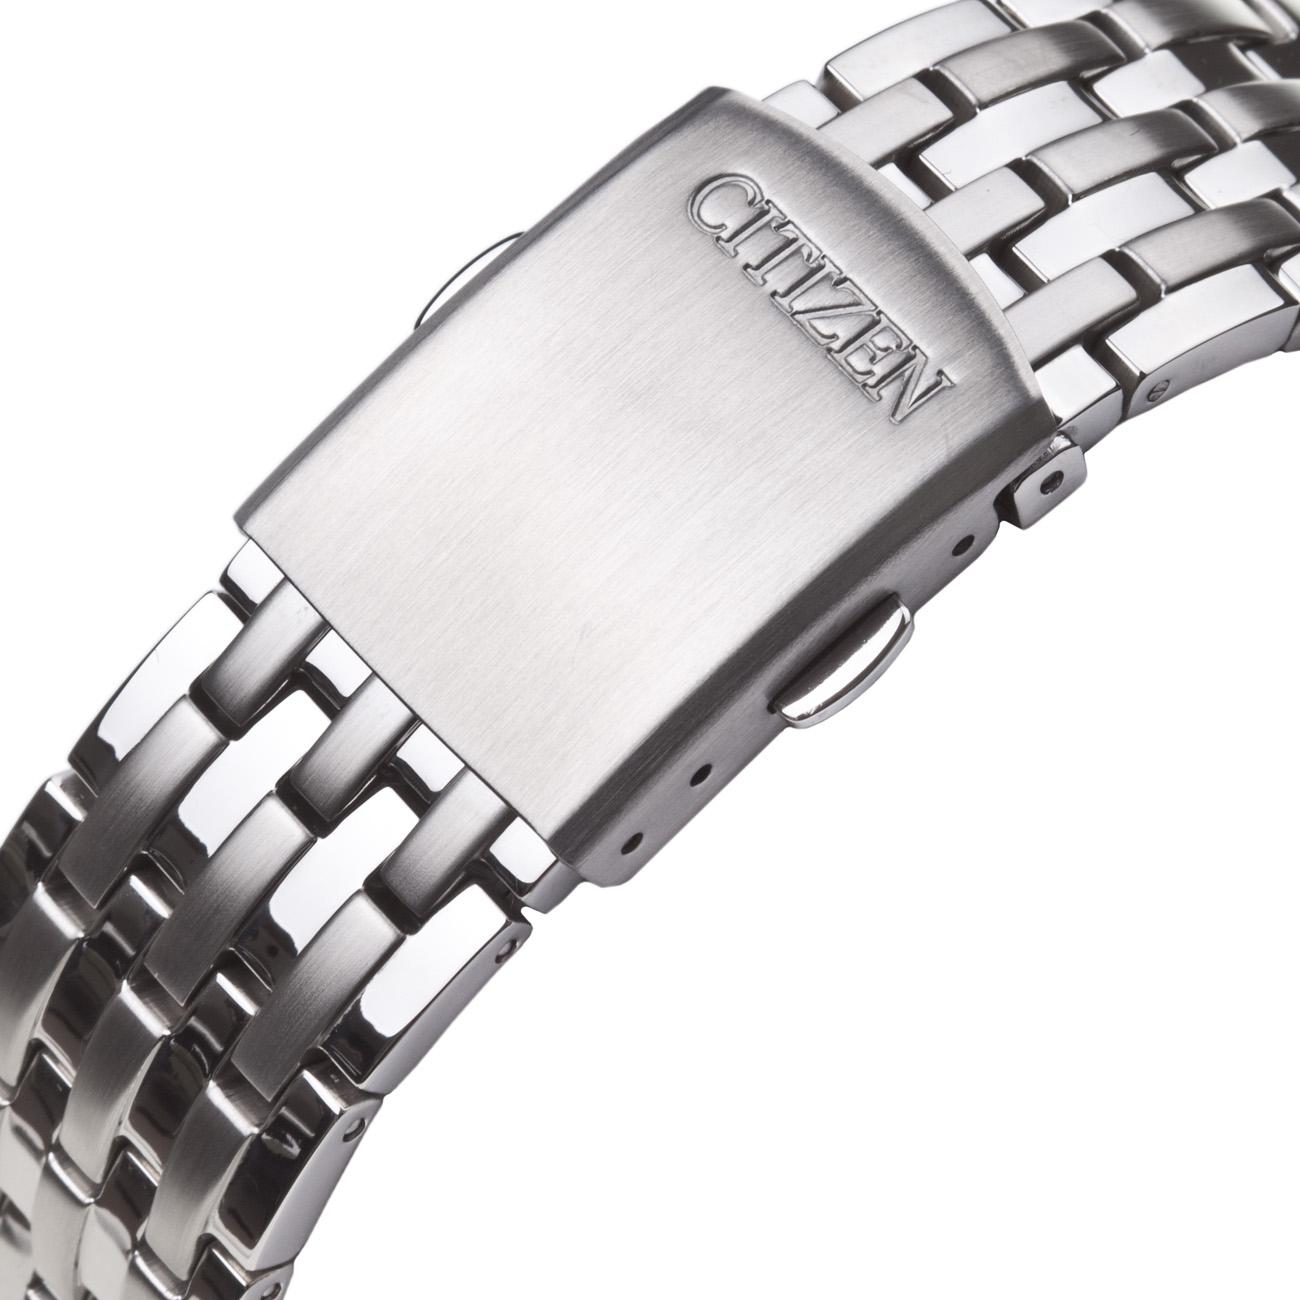 Đồng hồ Citizen chốt khắc